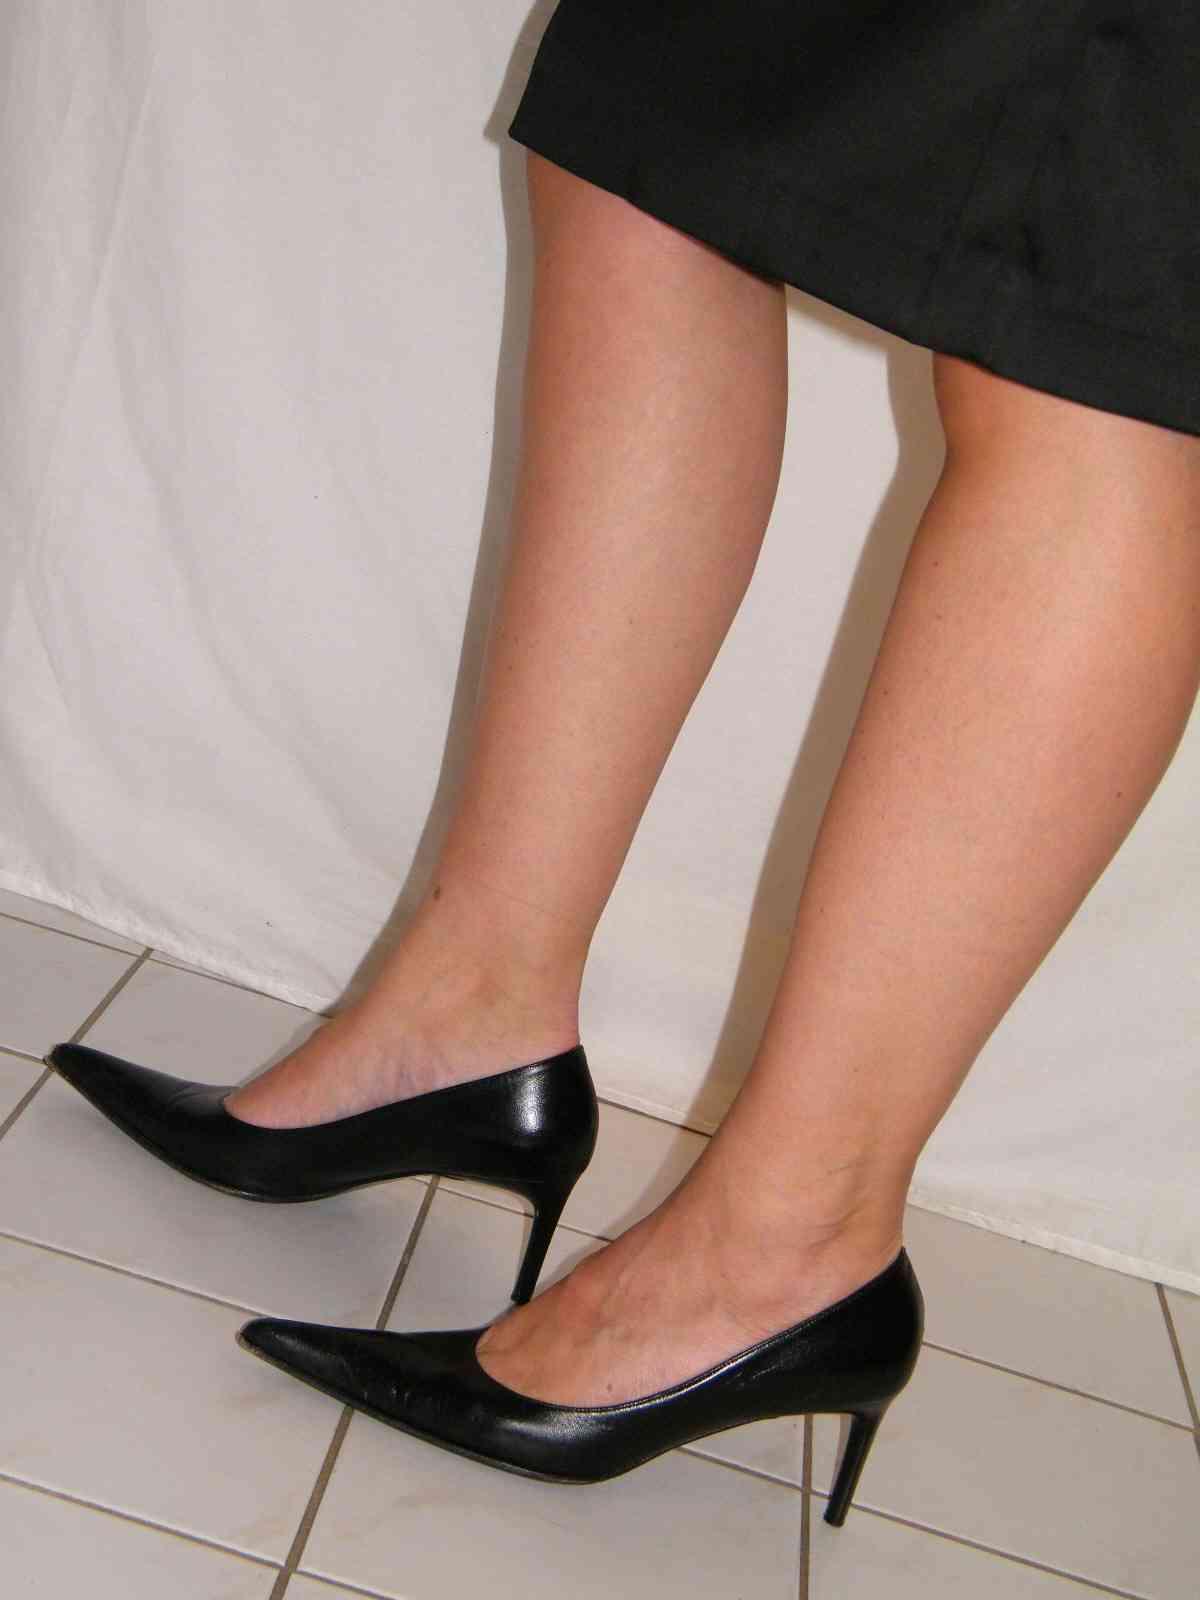 sexy vicary italy 8cm echtleder luxus stiletto high heels. Black Bedroom Furniture Sets. Home Design Ideas